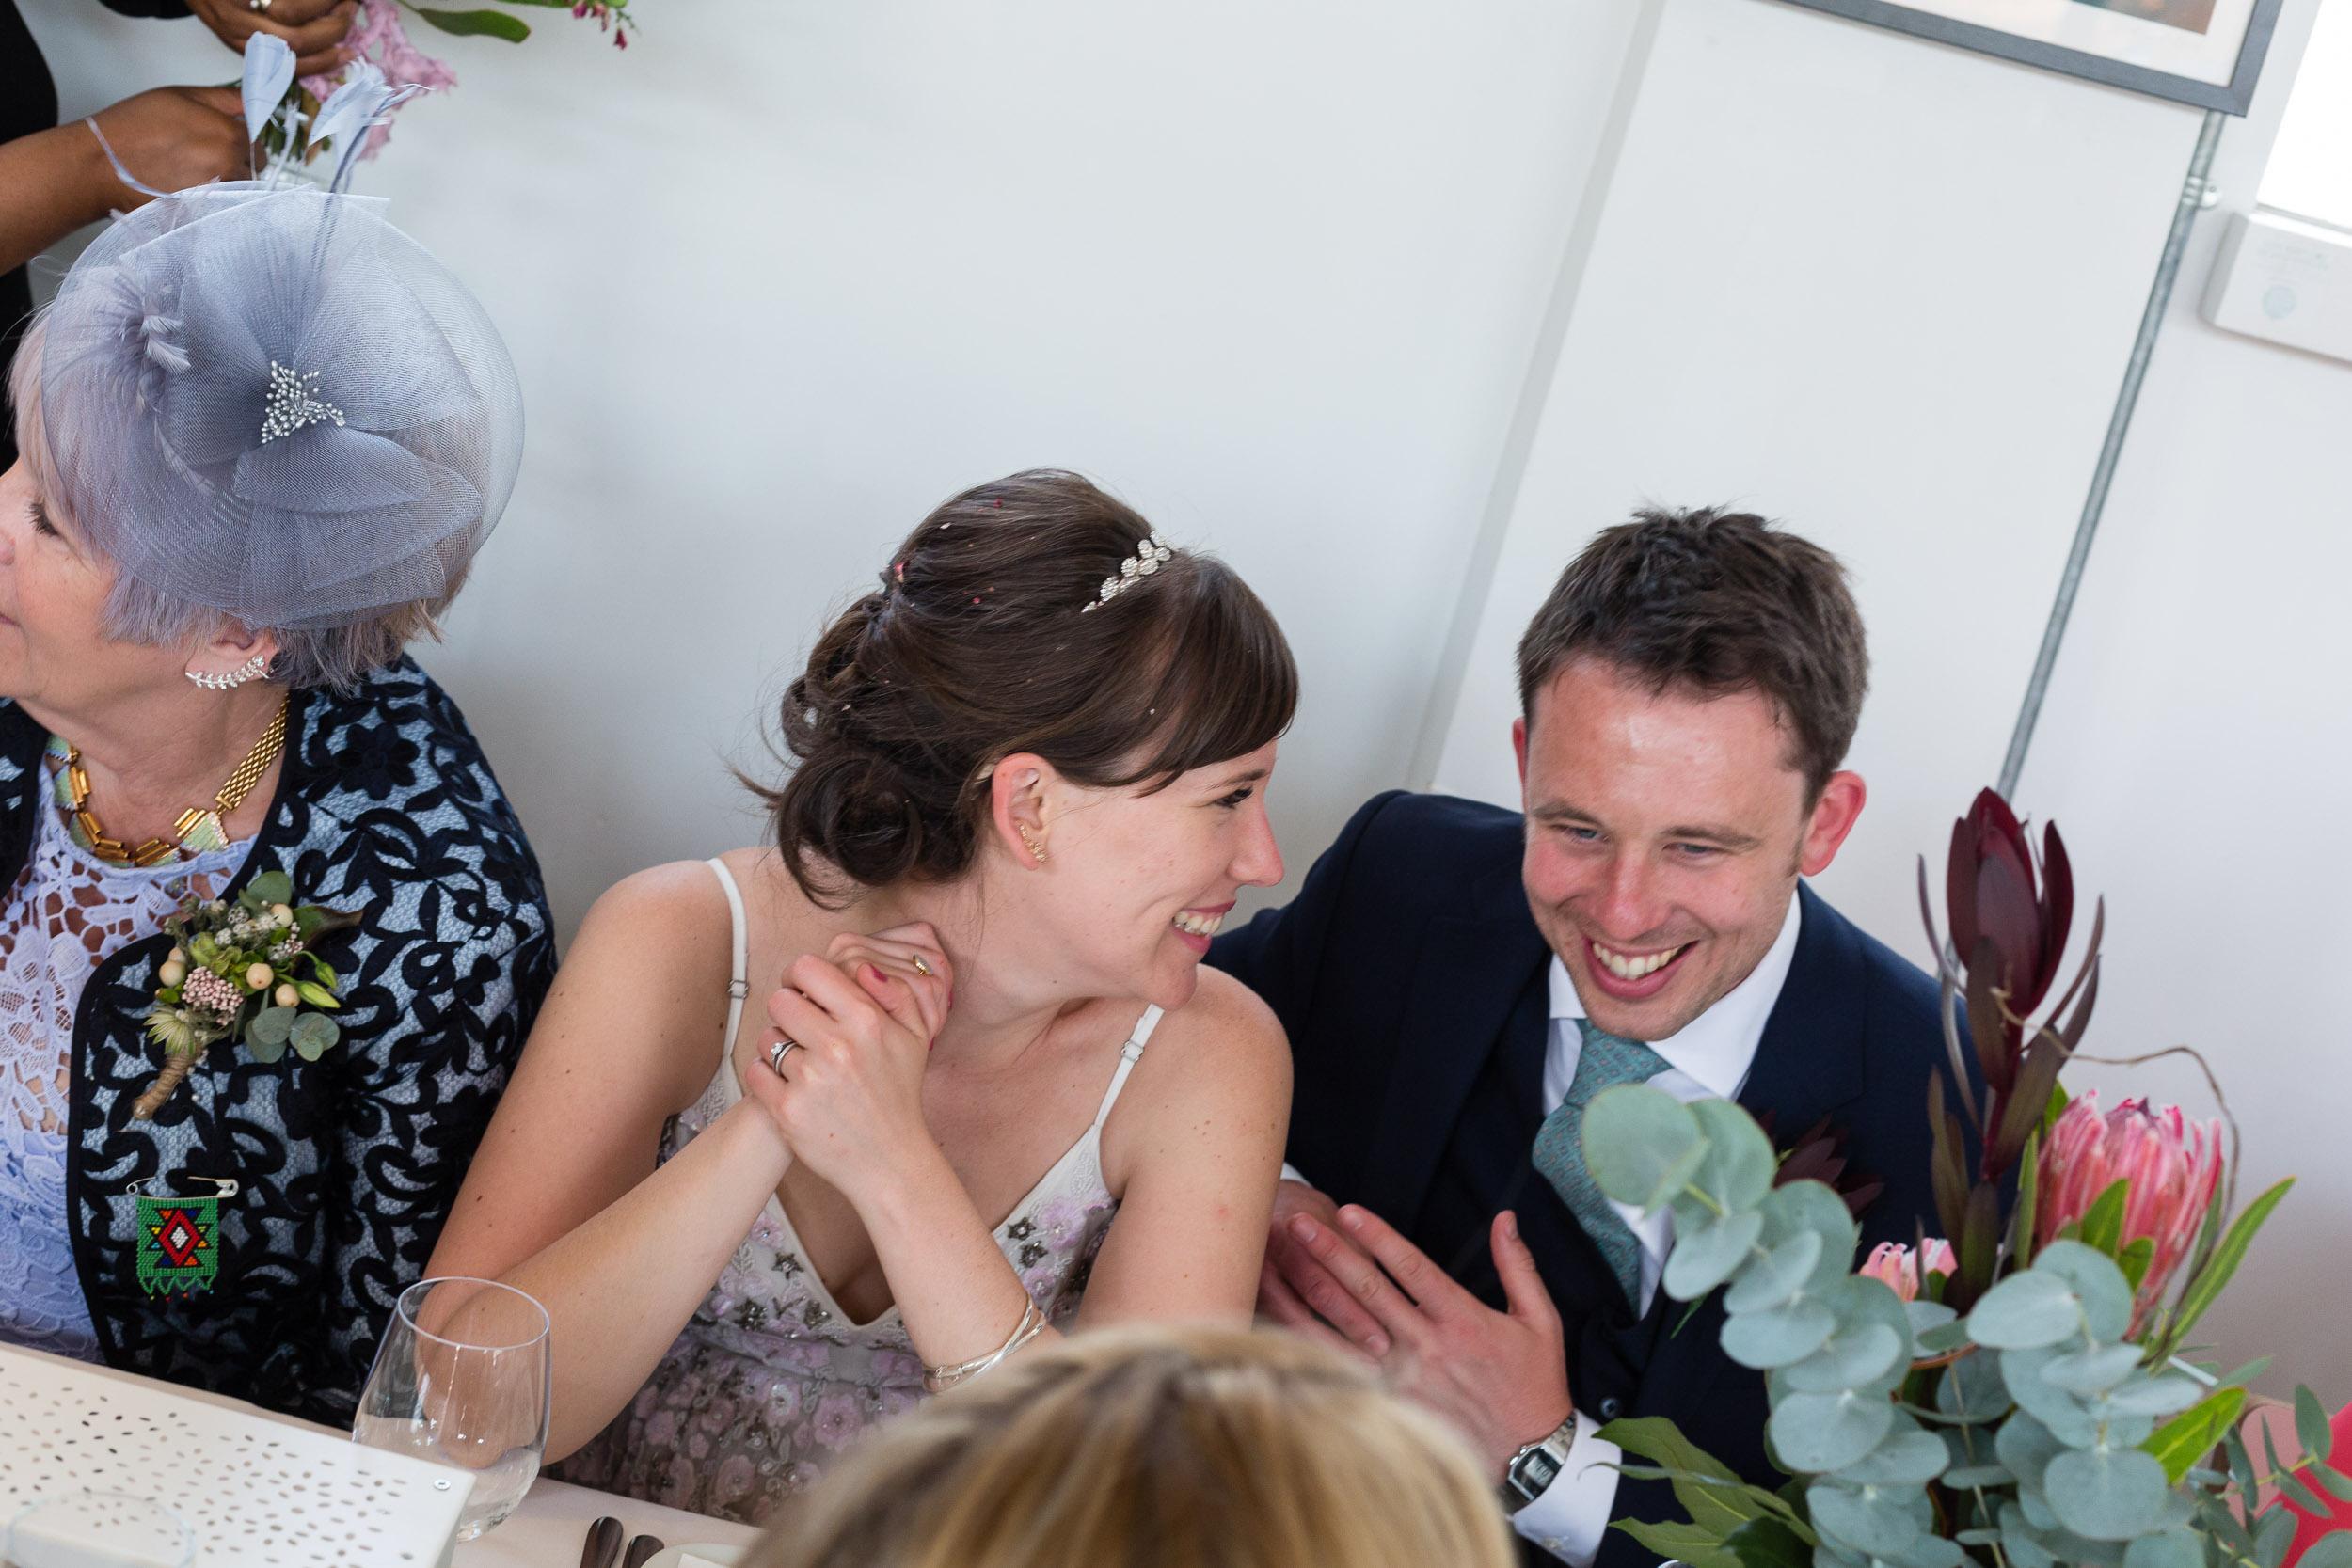 brockwell-lido-brixton-herne-hill-wedding-307.jpg